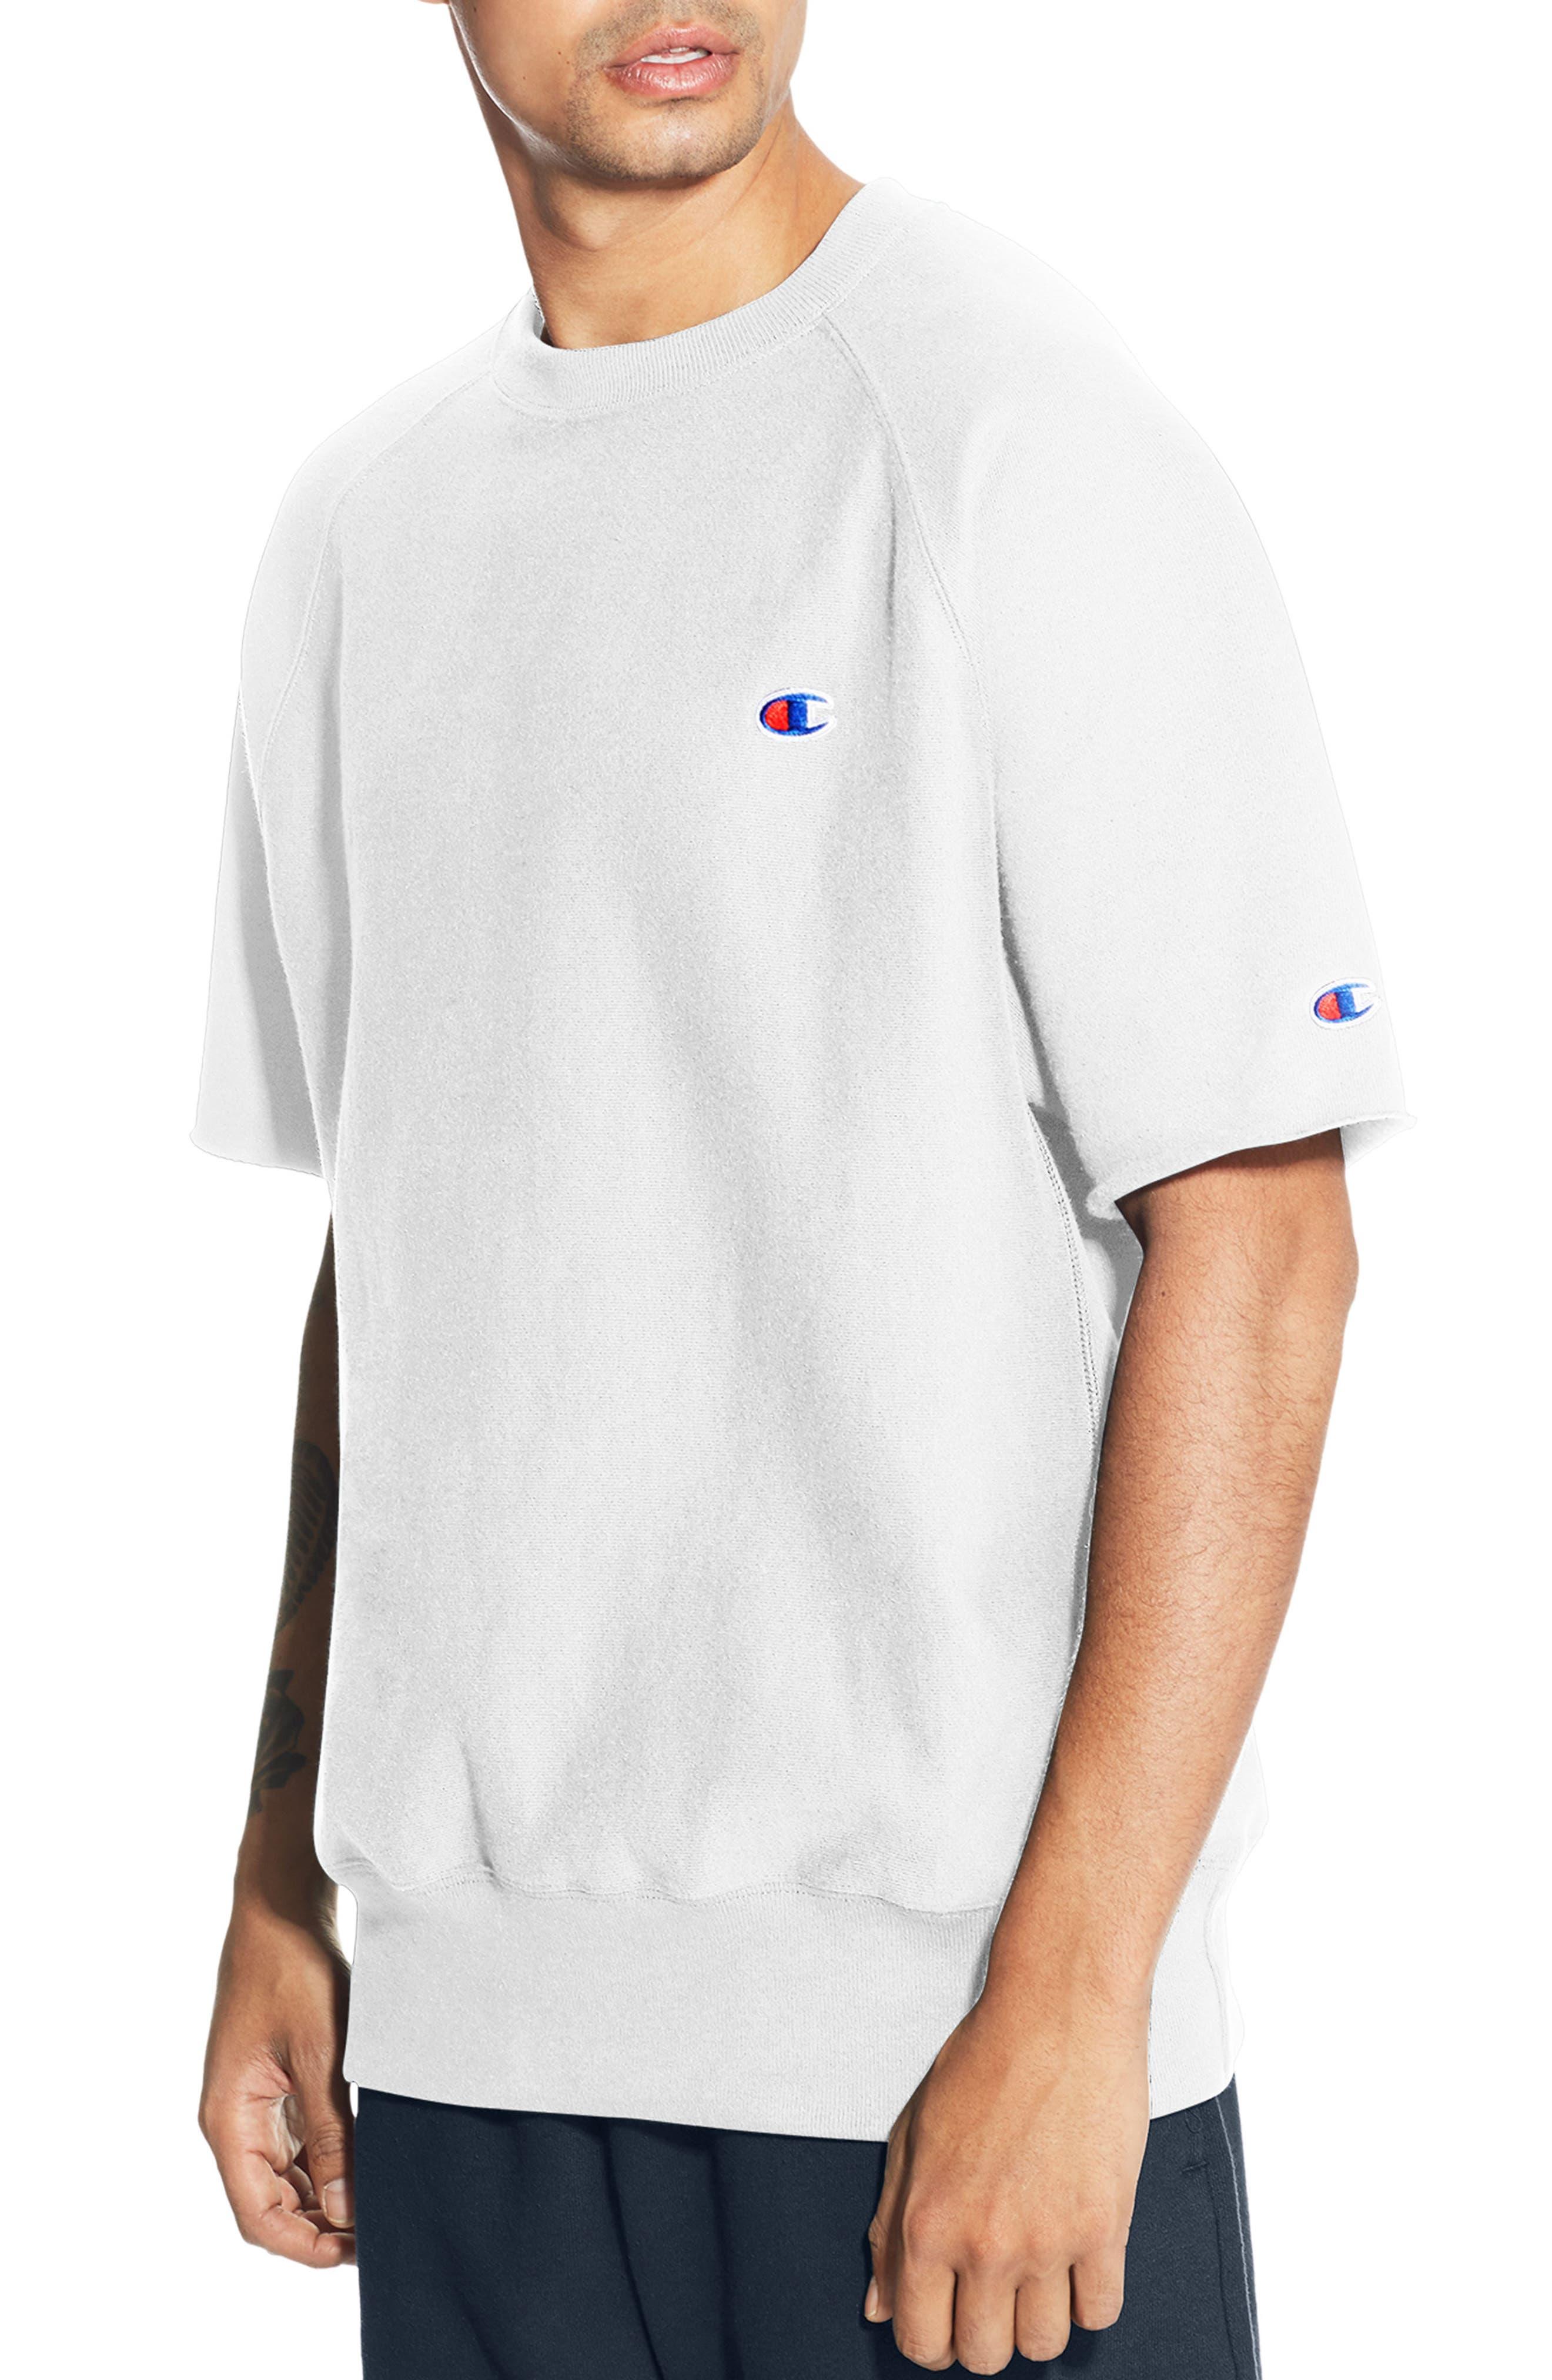 Reverse Weave Short Sleeve Sweatshirt,                             Main thumbnail 1, color,                             WHITE